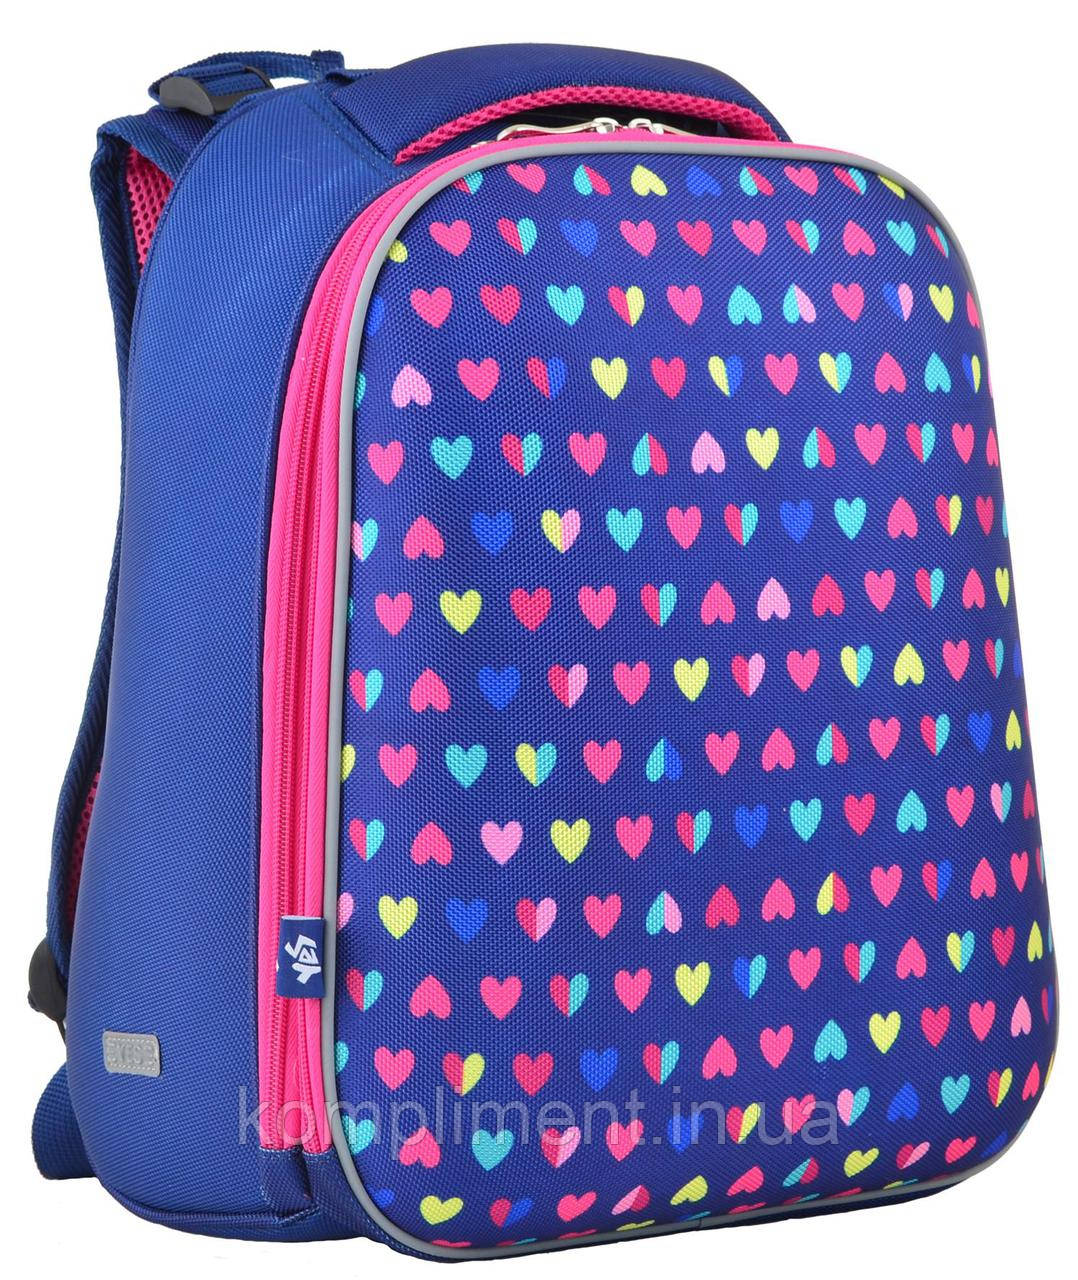 Ранец школьный жестко-каркасный  H-12 Hearts , 38*29*15 , YES